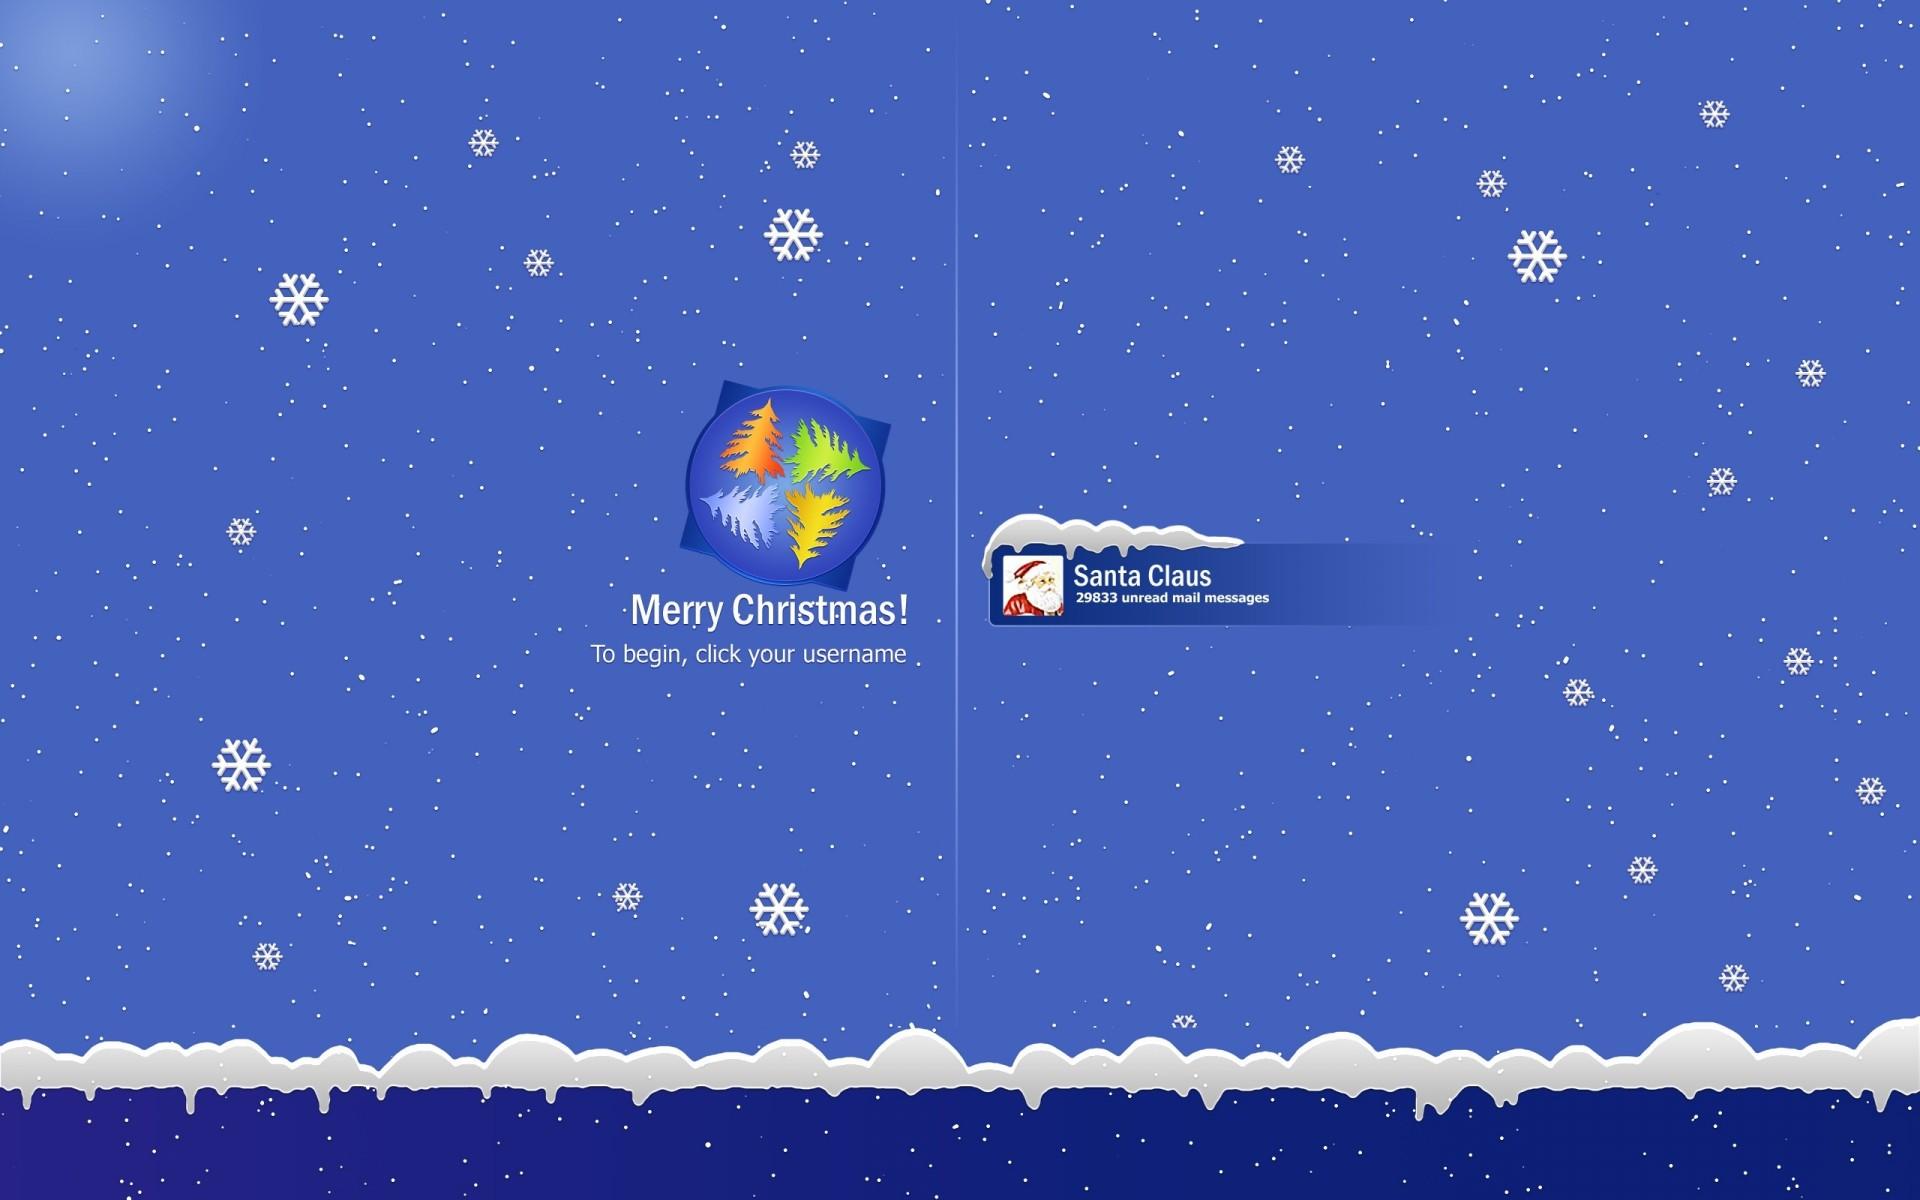 christmas seasons windows microsoft tech computer santa flakes snowing 1920x1200